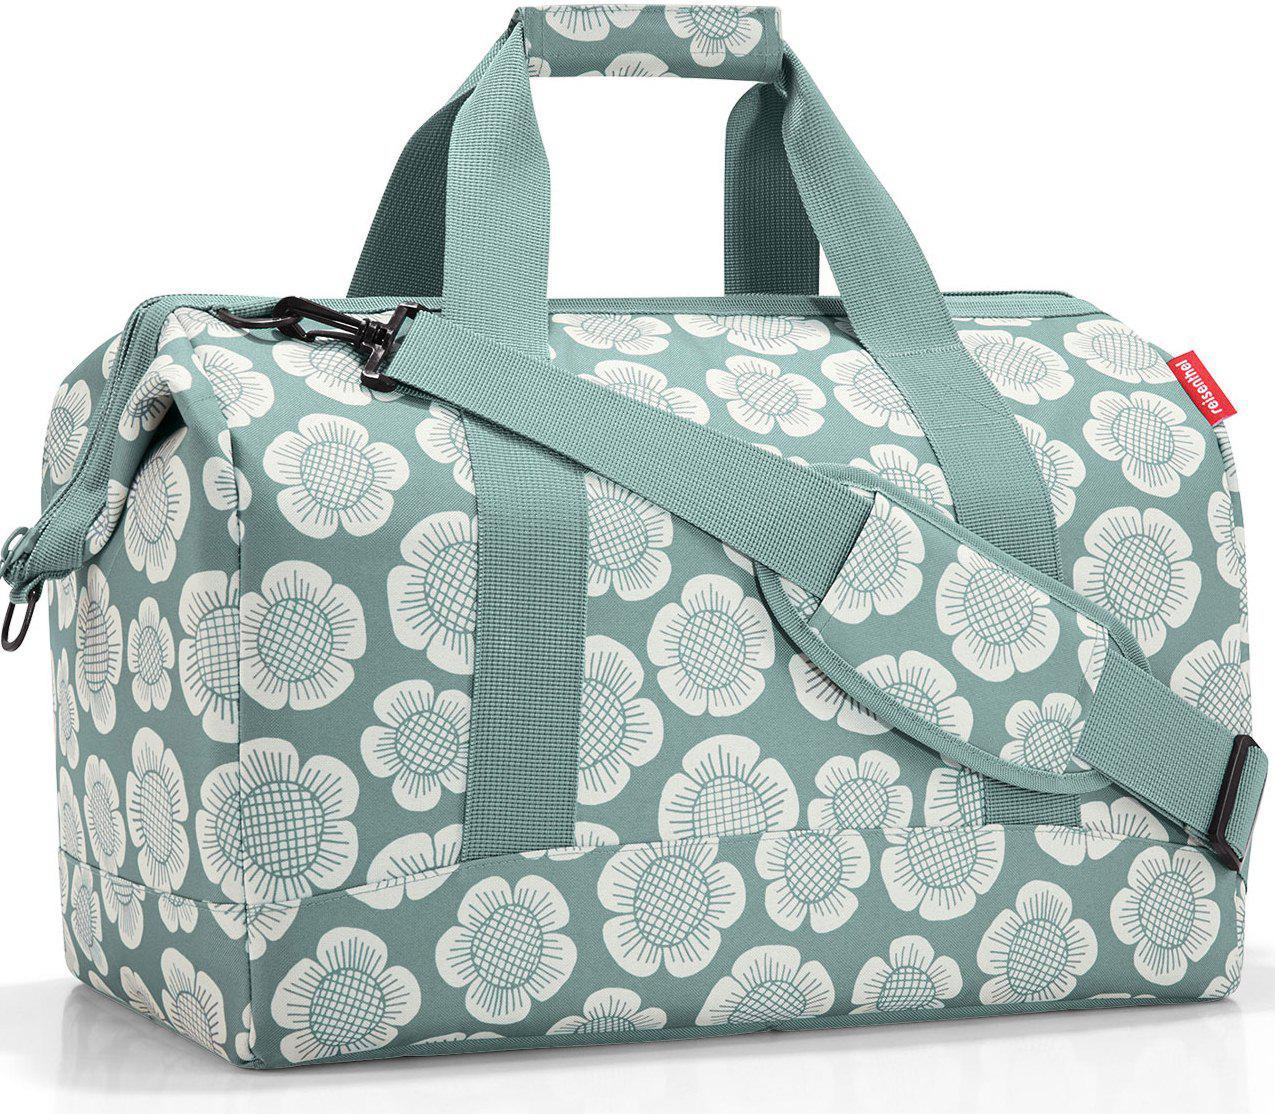 a438618e4c40 Женская дорожная сумка Reisenthel, MT5037, 30 л., текстиль, серый -  SUPERSUMKA